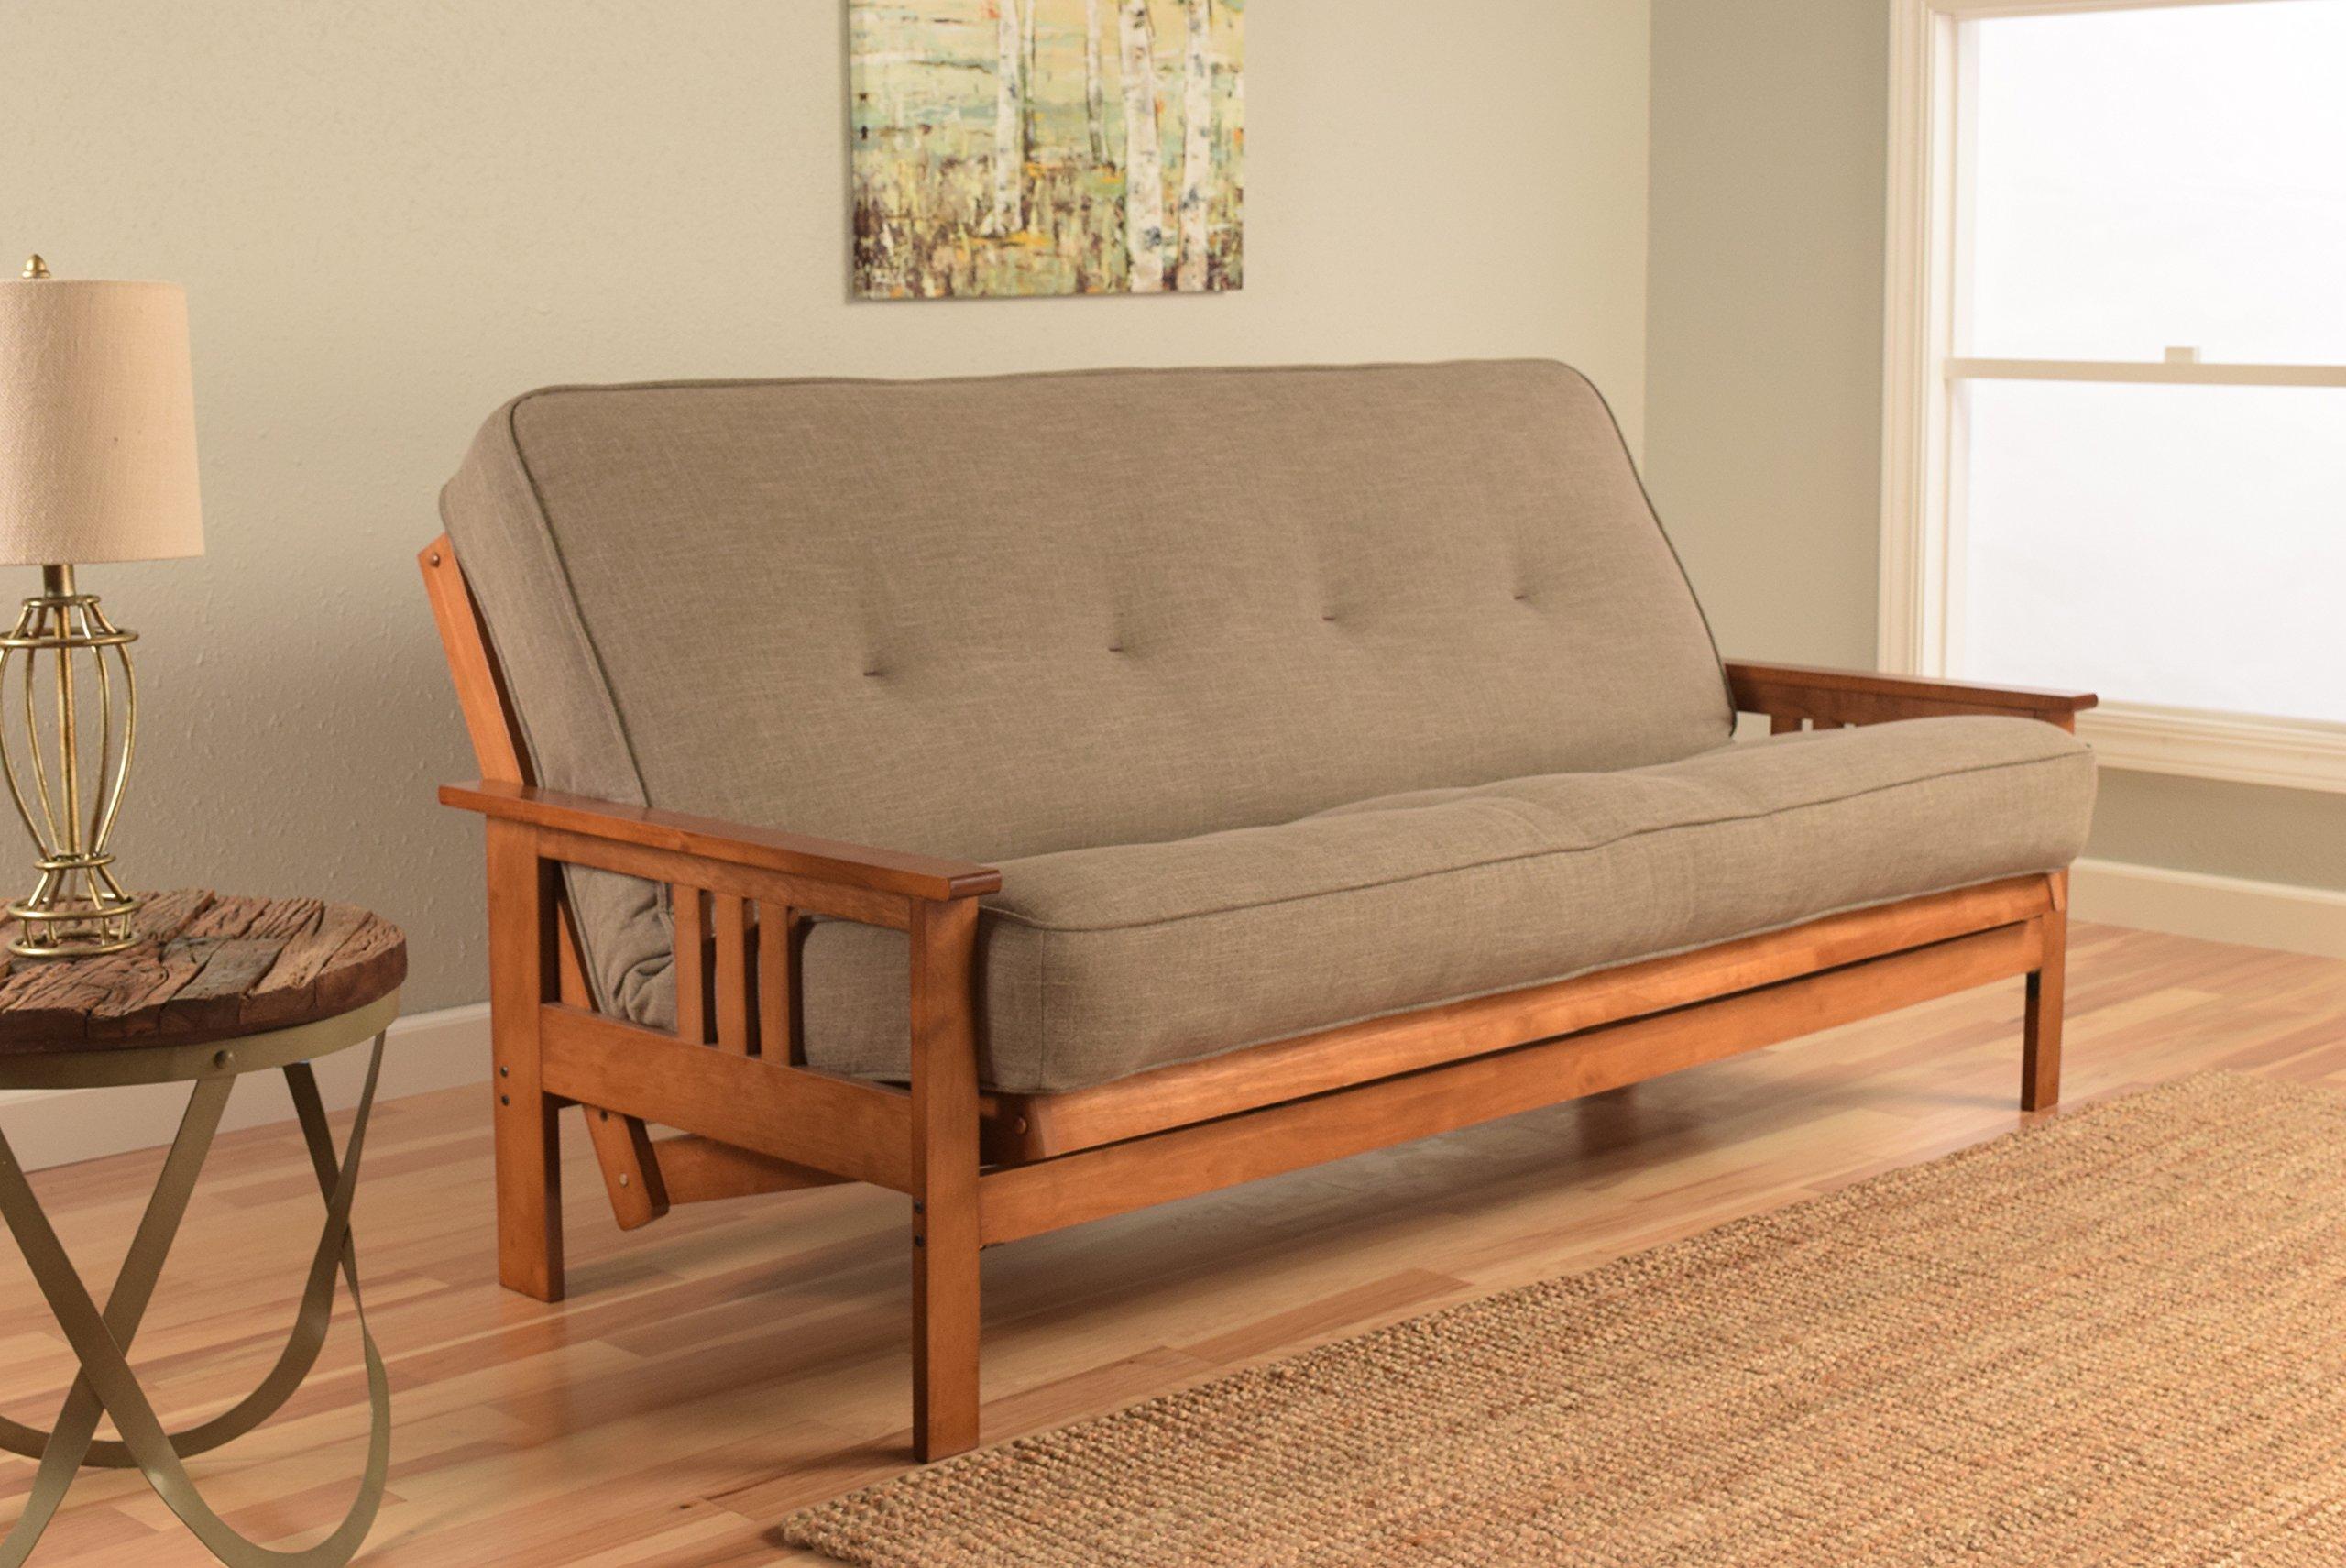 Kodiak Furniture KFMOBBLSTNLF5MD3 Monterey Futon Set with Barbados Finish, Full, Linen Stone by Kodiak Furniture